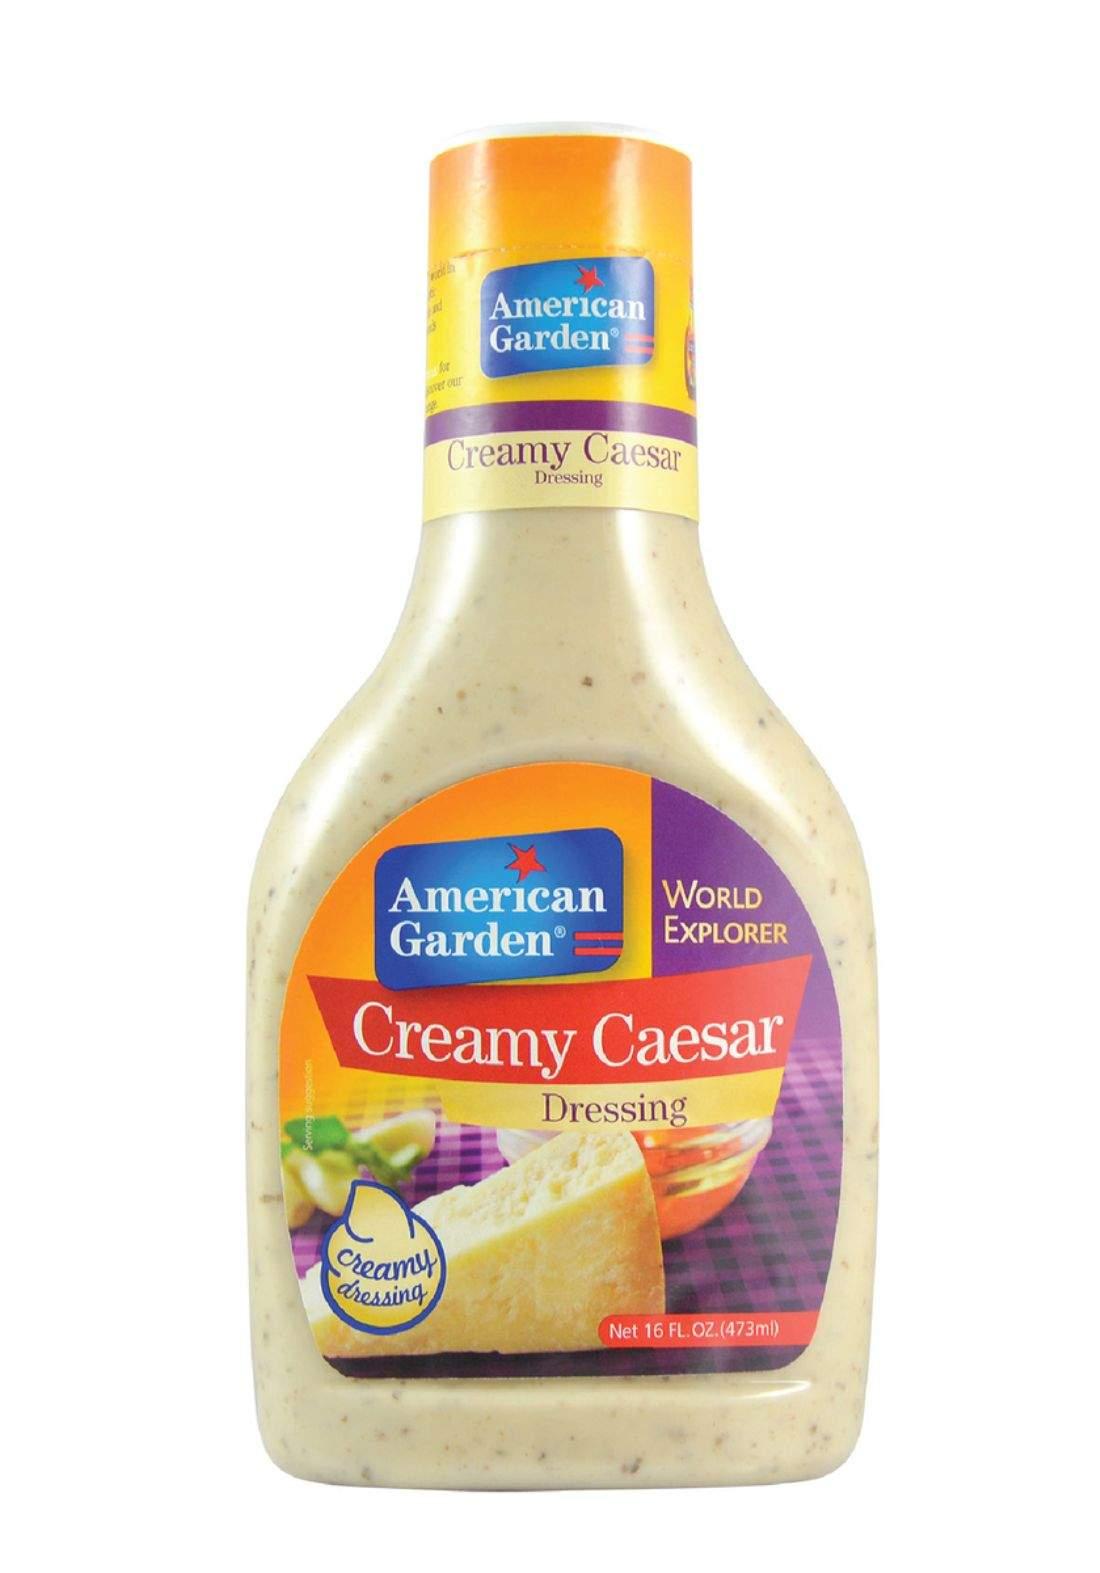 American Garden Creamy Caesar dressing صلصة سيزر كريمية